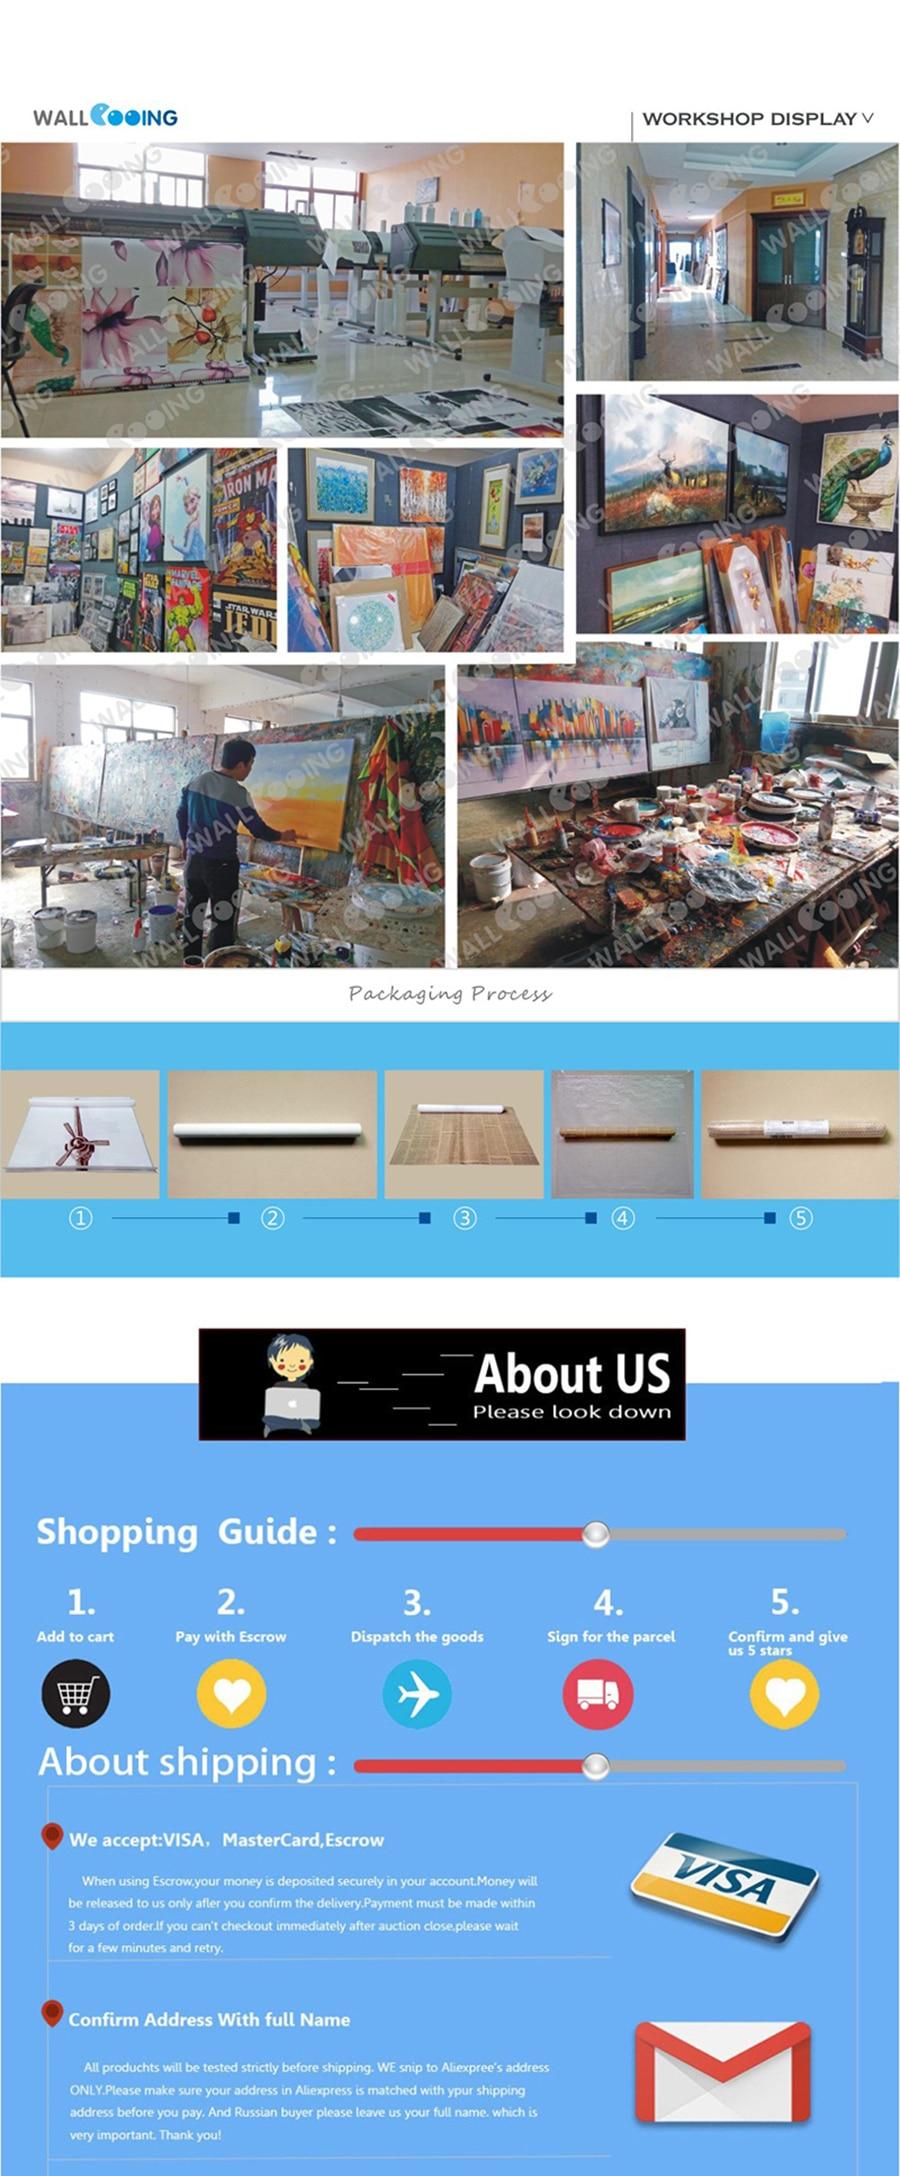 5-Production workshop and shopping process description